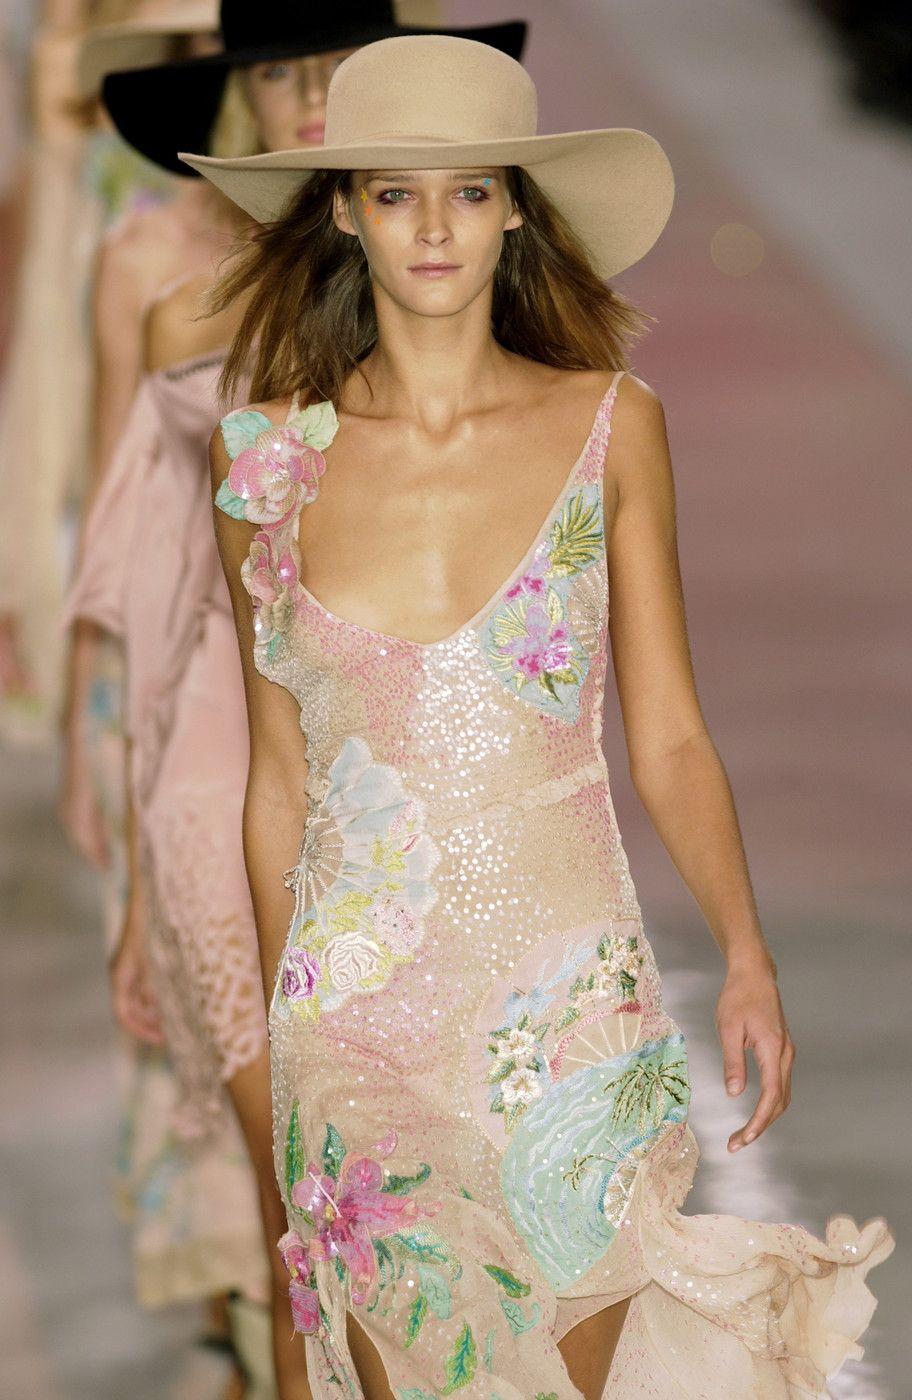 Pin by Logan Fox on My Style | Fashion, Pretty blouses